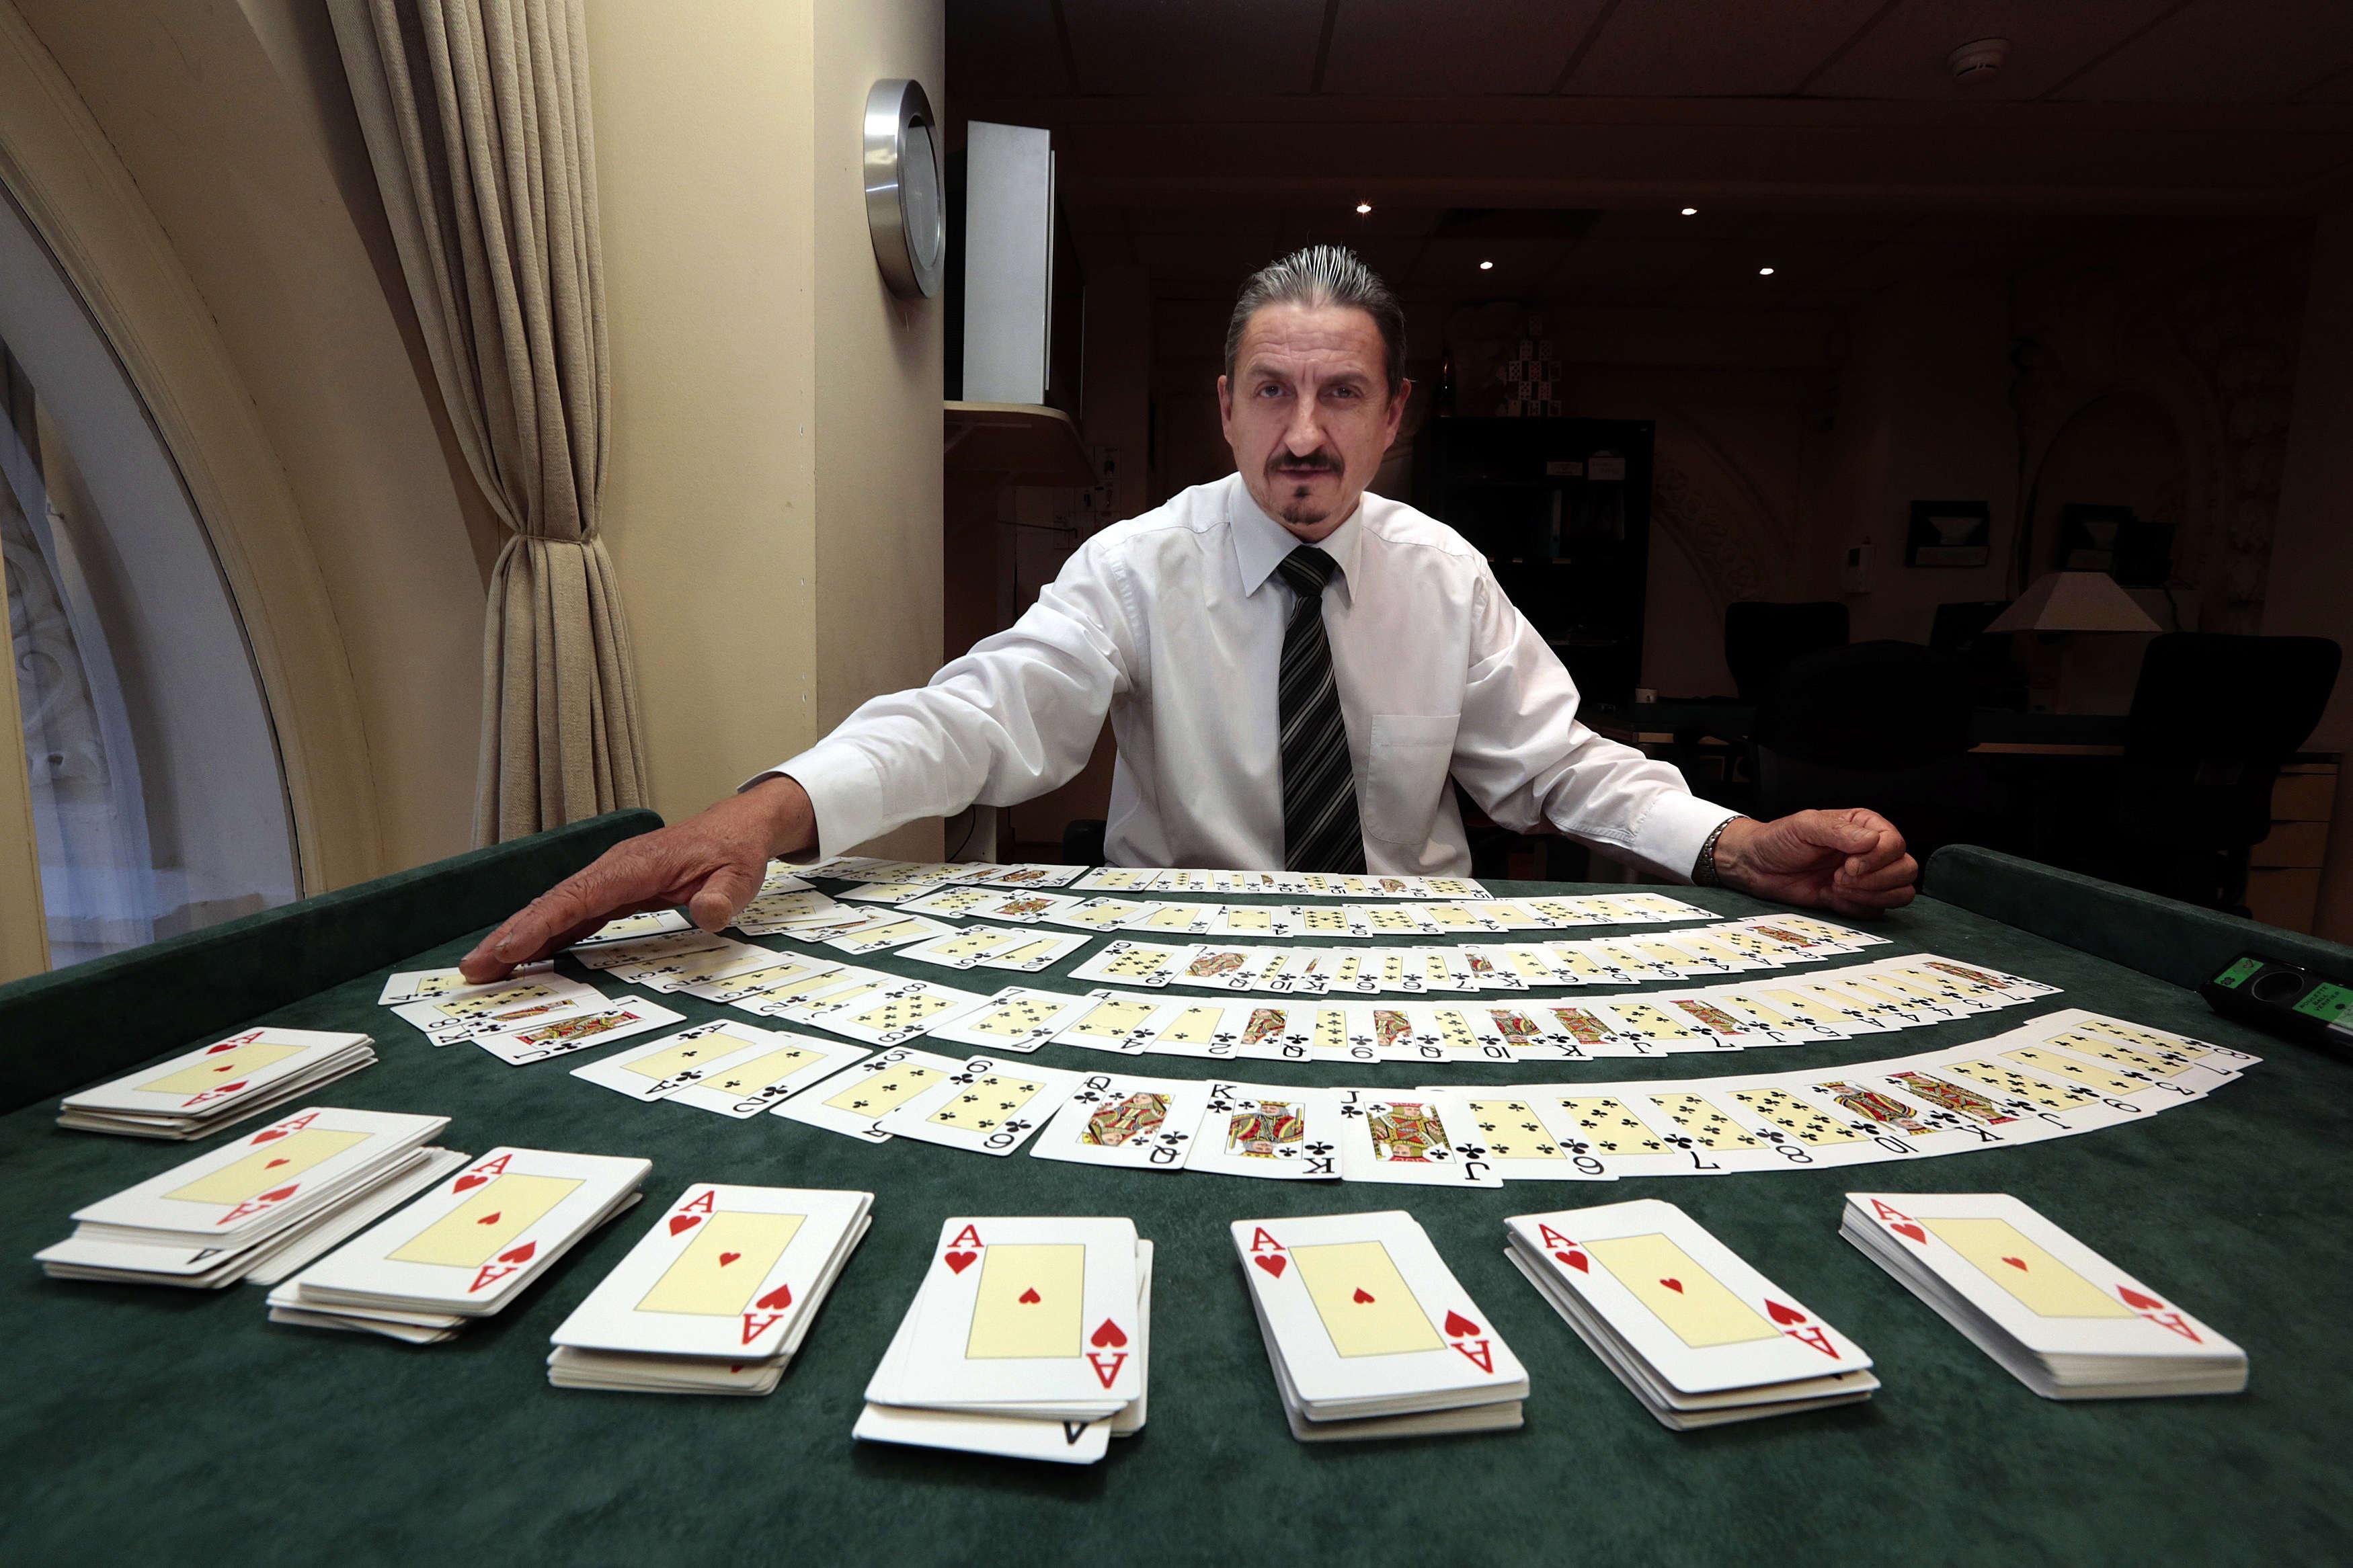 Croupier casino de casino night-jaxon colt-ashton webber-arad-owen michaels